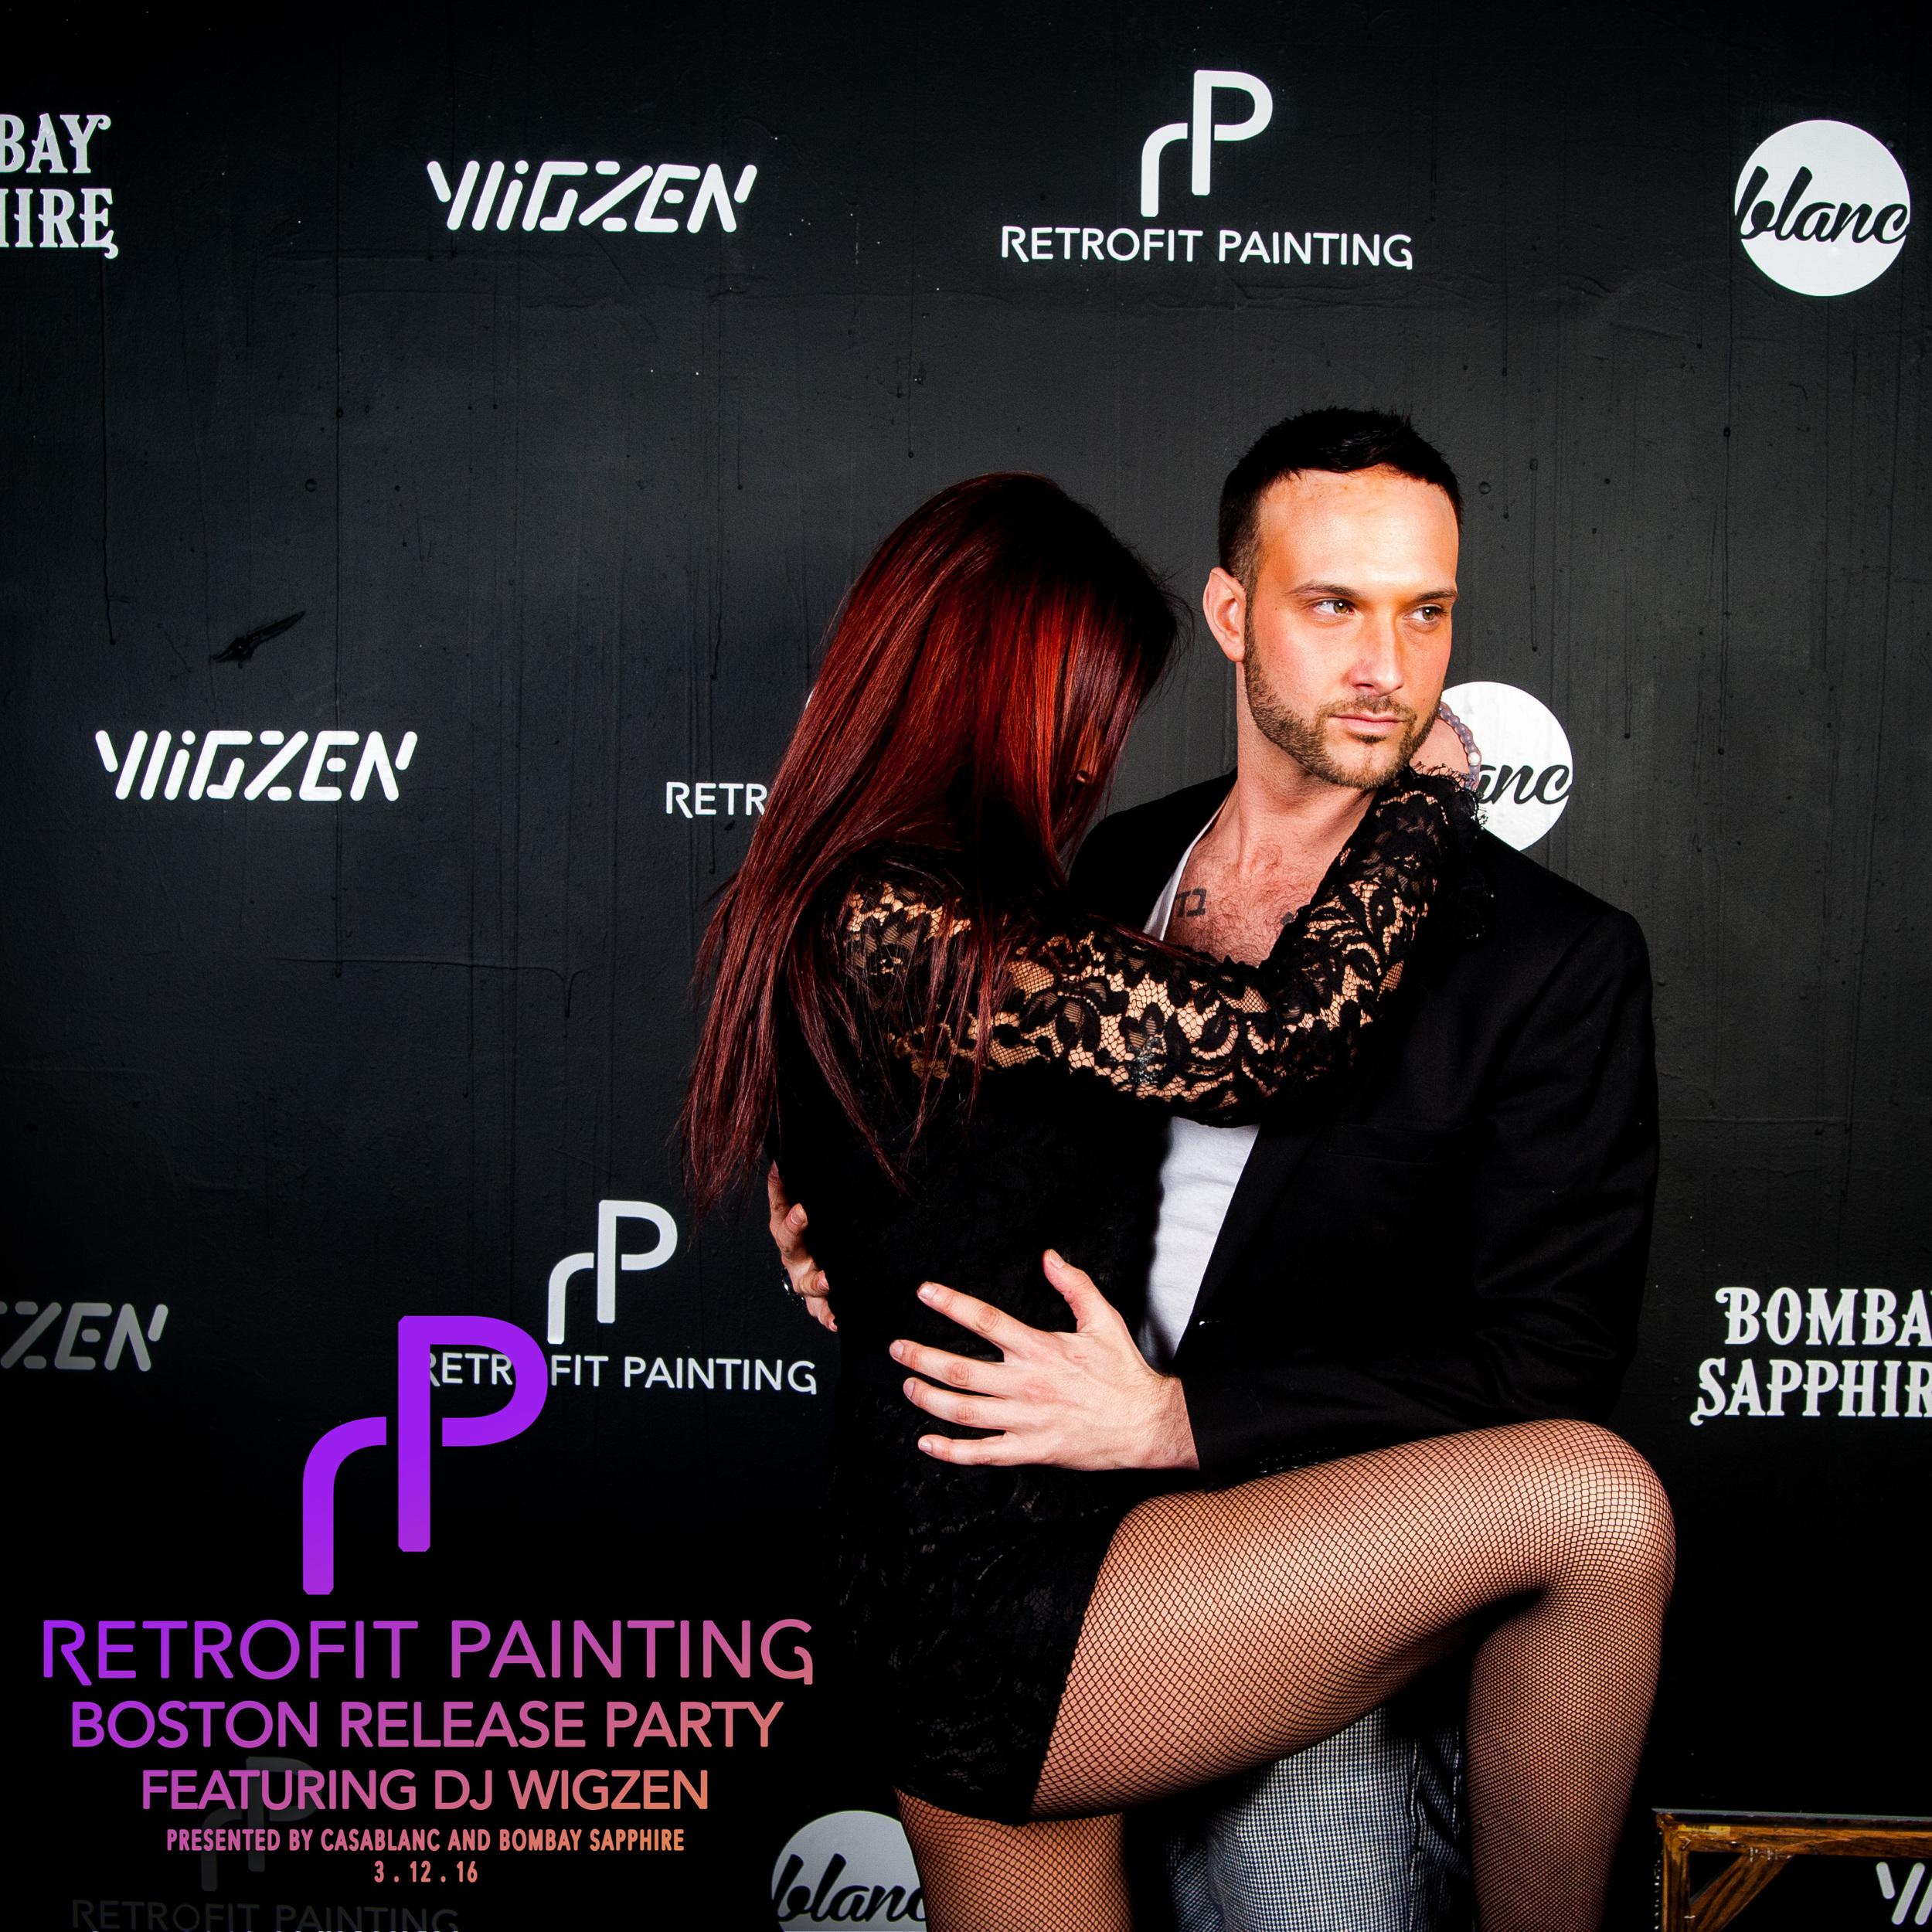 Retrofit Painting Boston Release Party 002-2.jpg